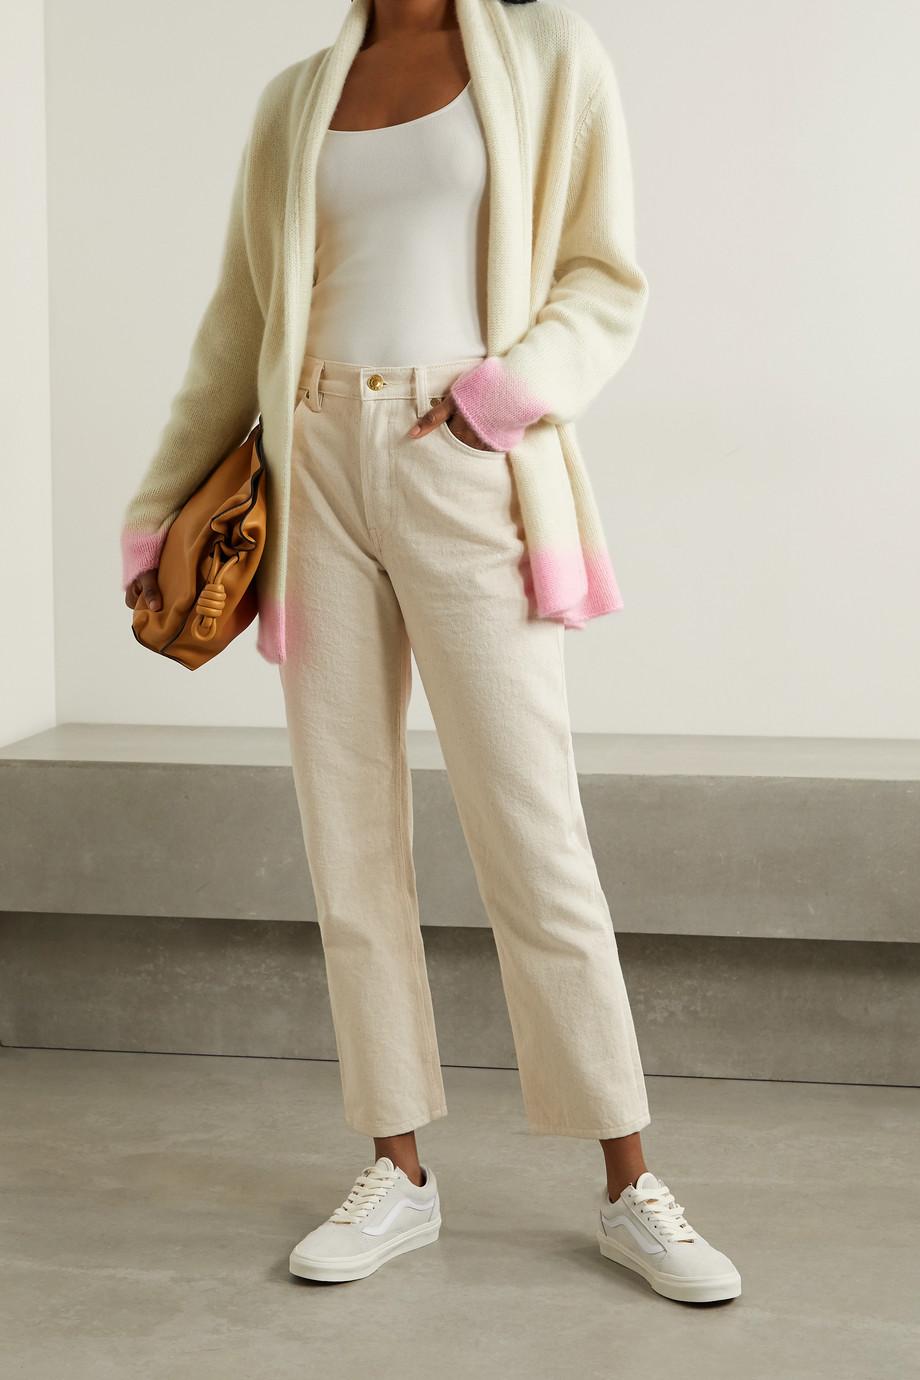 The Elder Statesman Two-tone cashmere cardigan